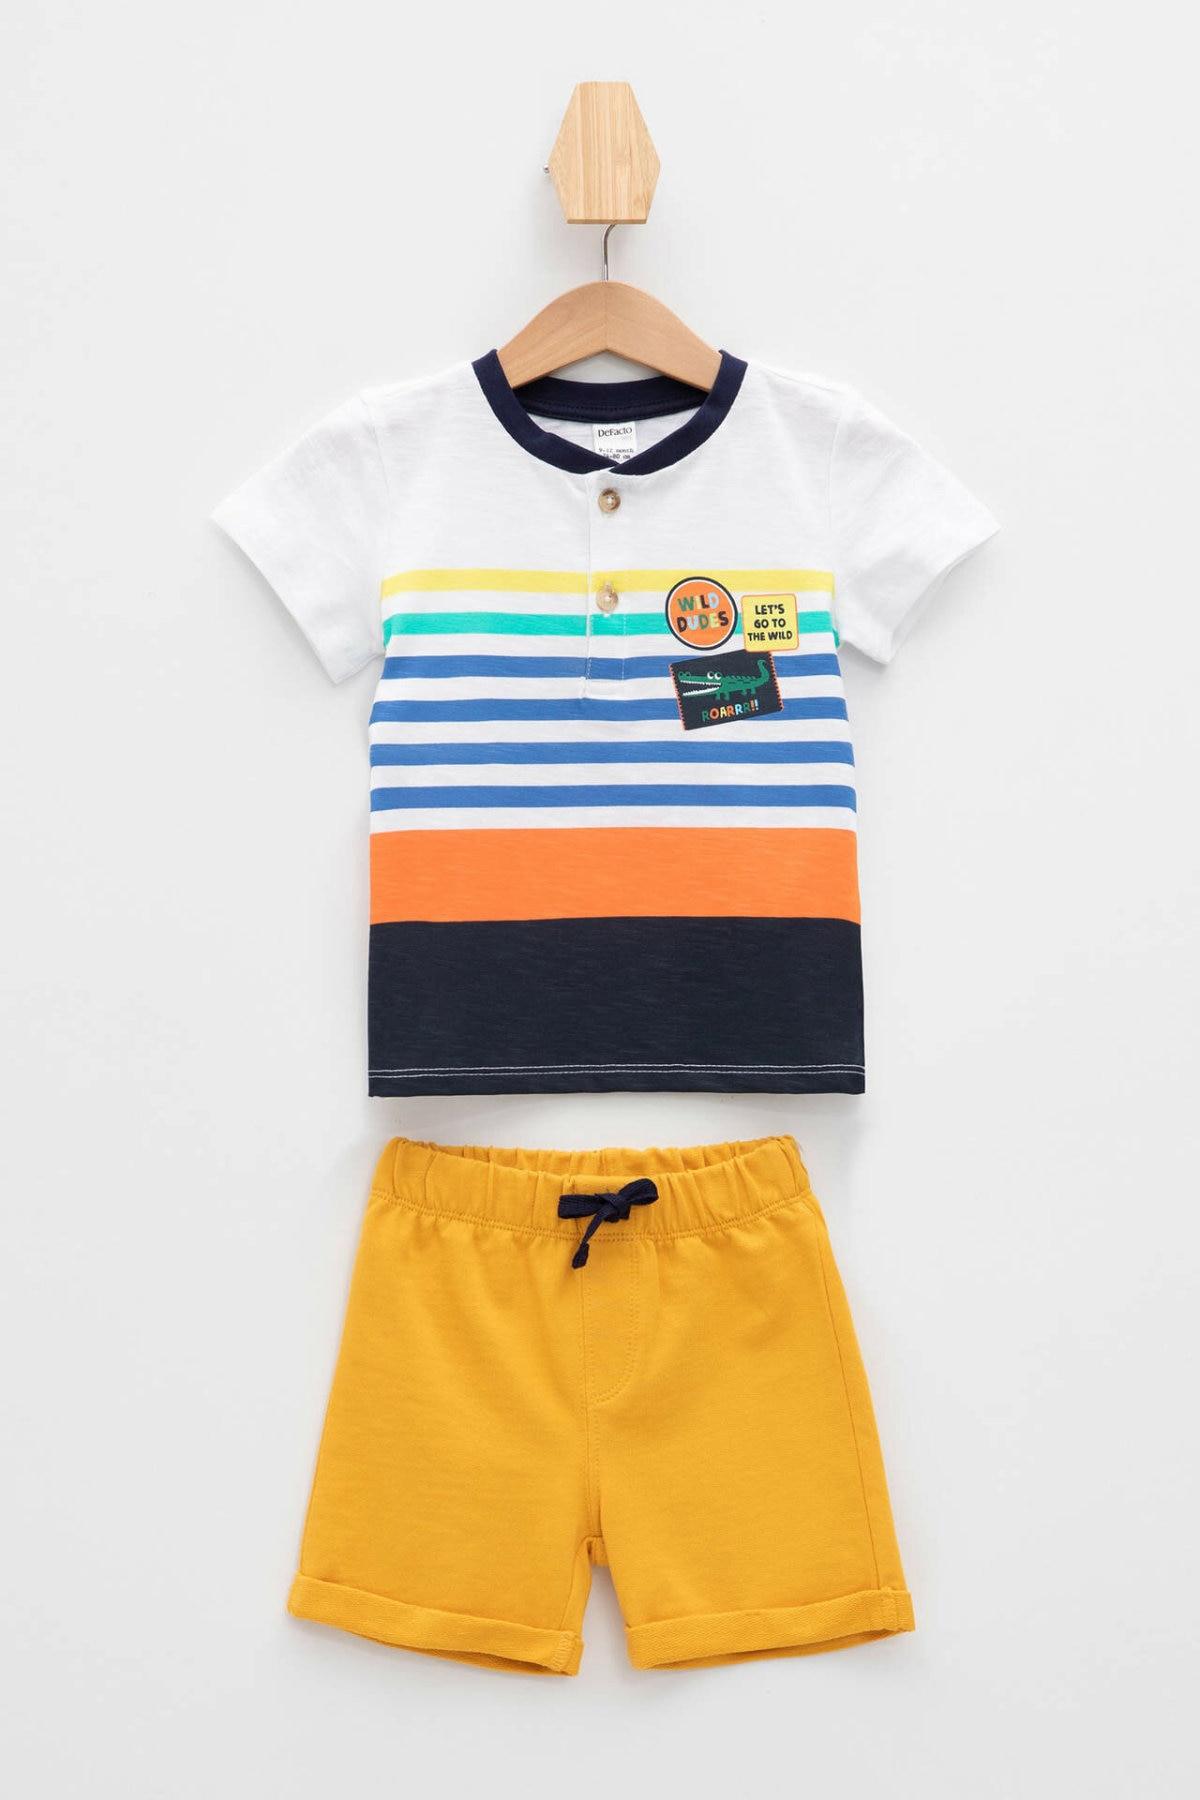 DeFacto Summer BabyBoy Set Casual Kids O-neck Shorts Sets Comfortable Boys Cute Pattern T-shirt Short Pant - L0223A219SM